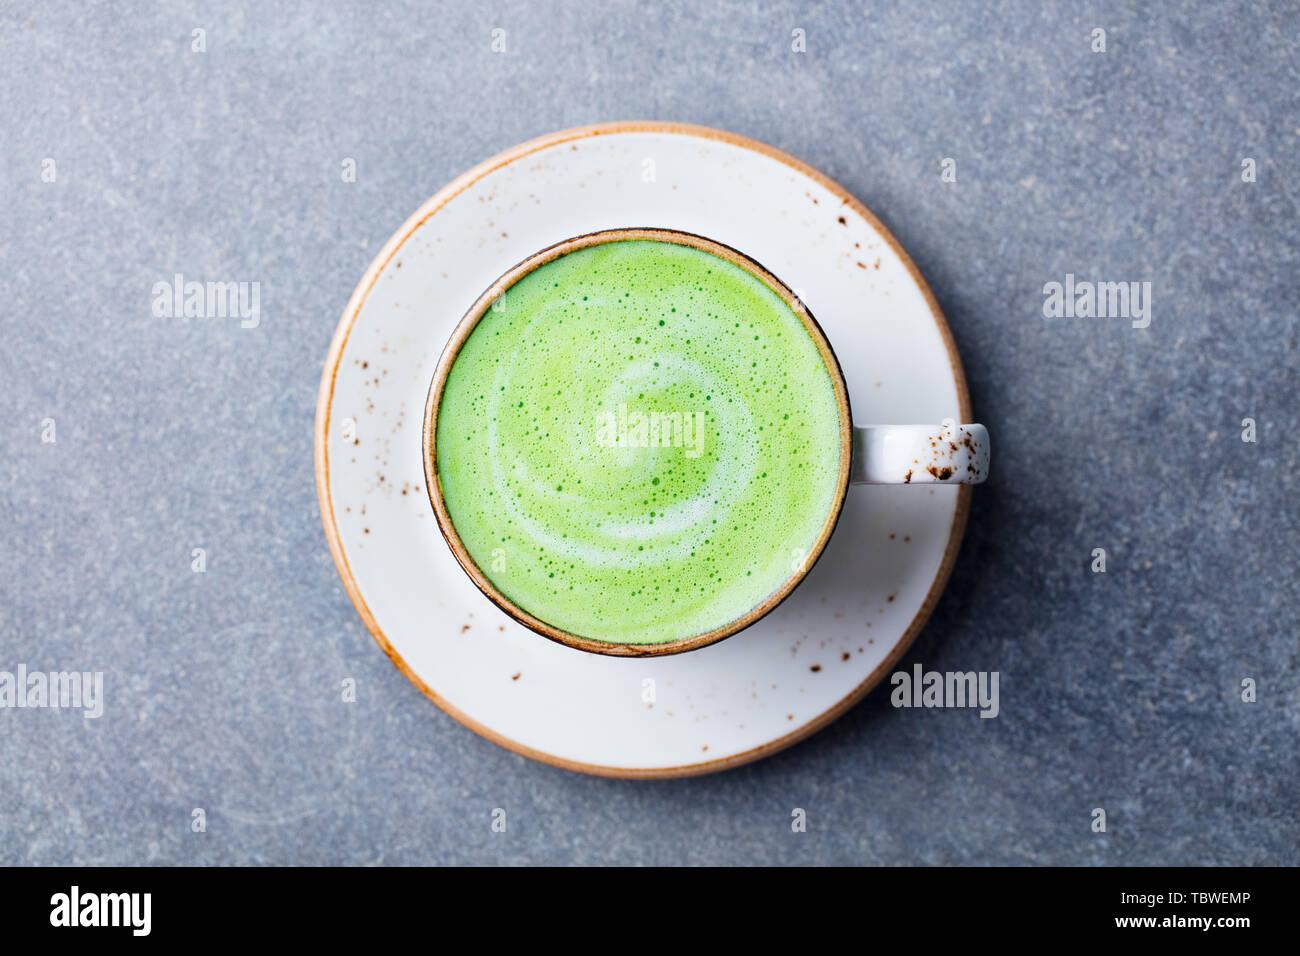 Té verde matcha latte en una copa. Fondo de piedra gris. Vista desde arriba. Foto de stock